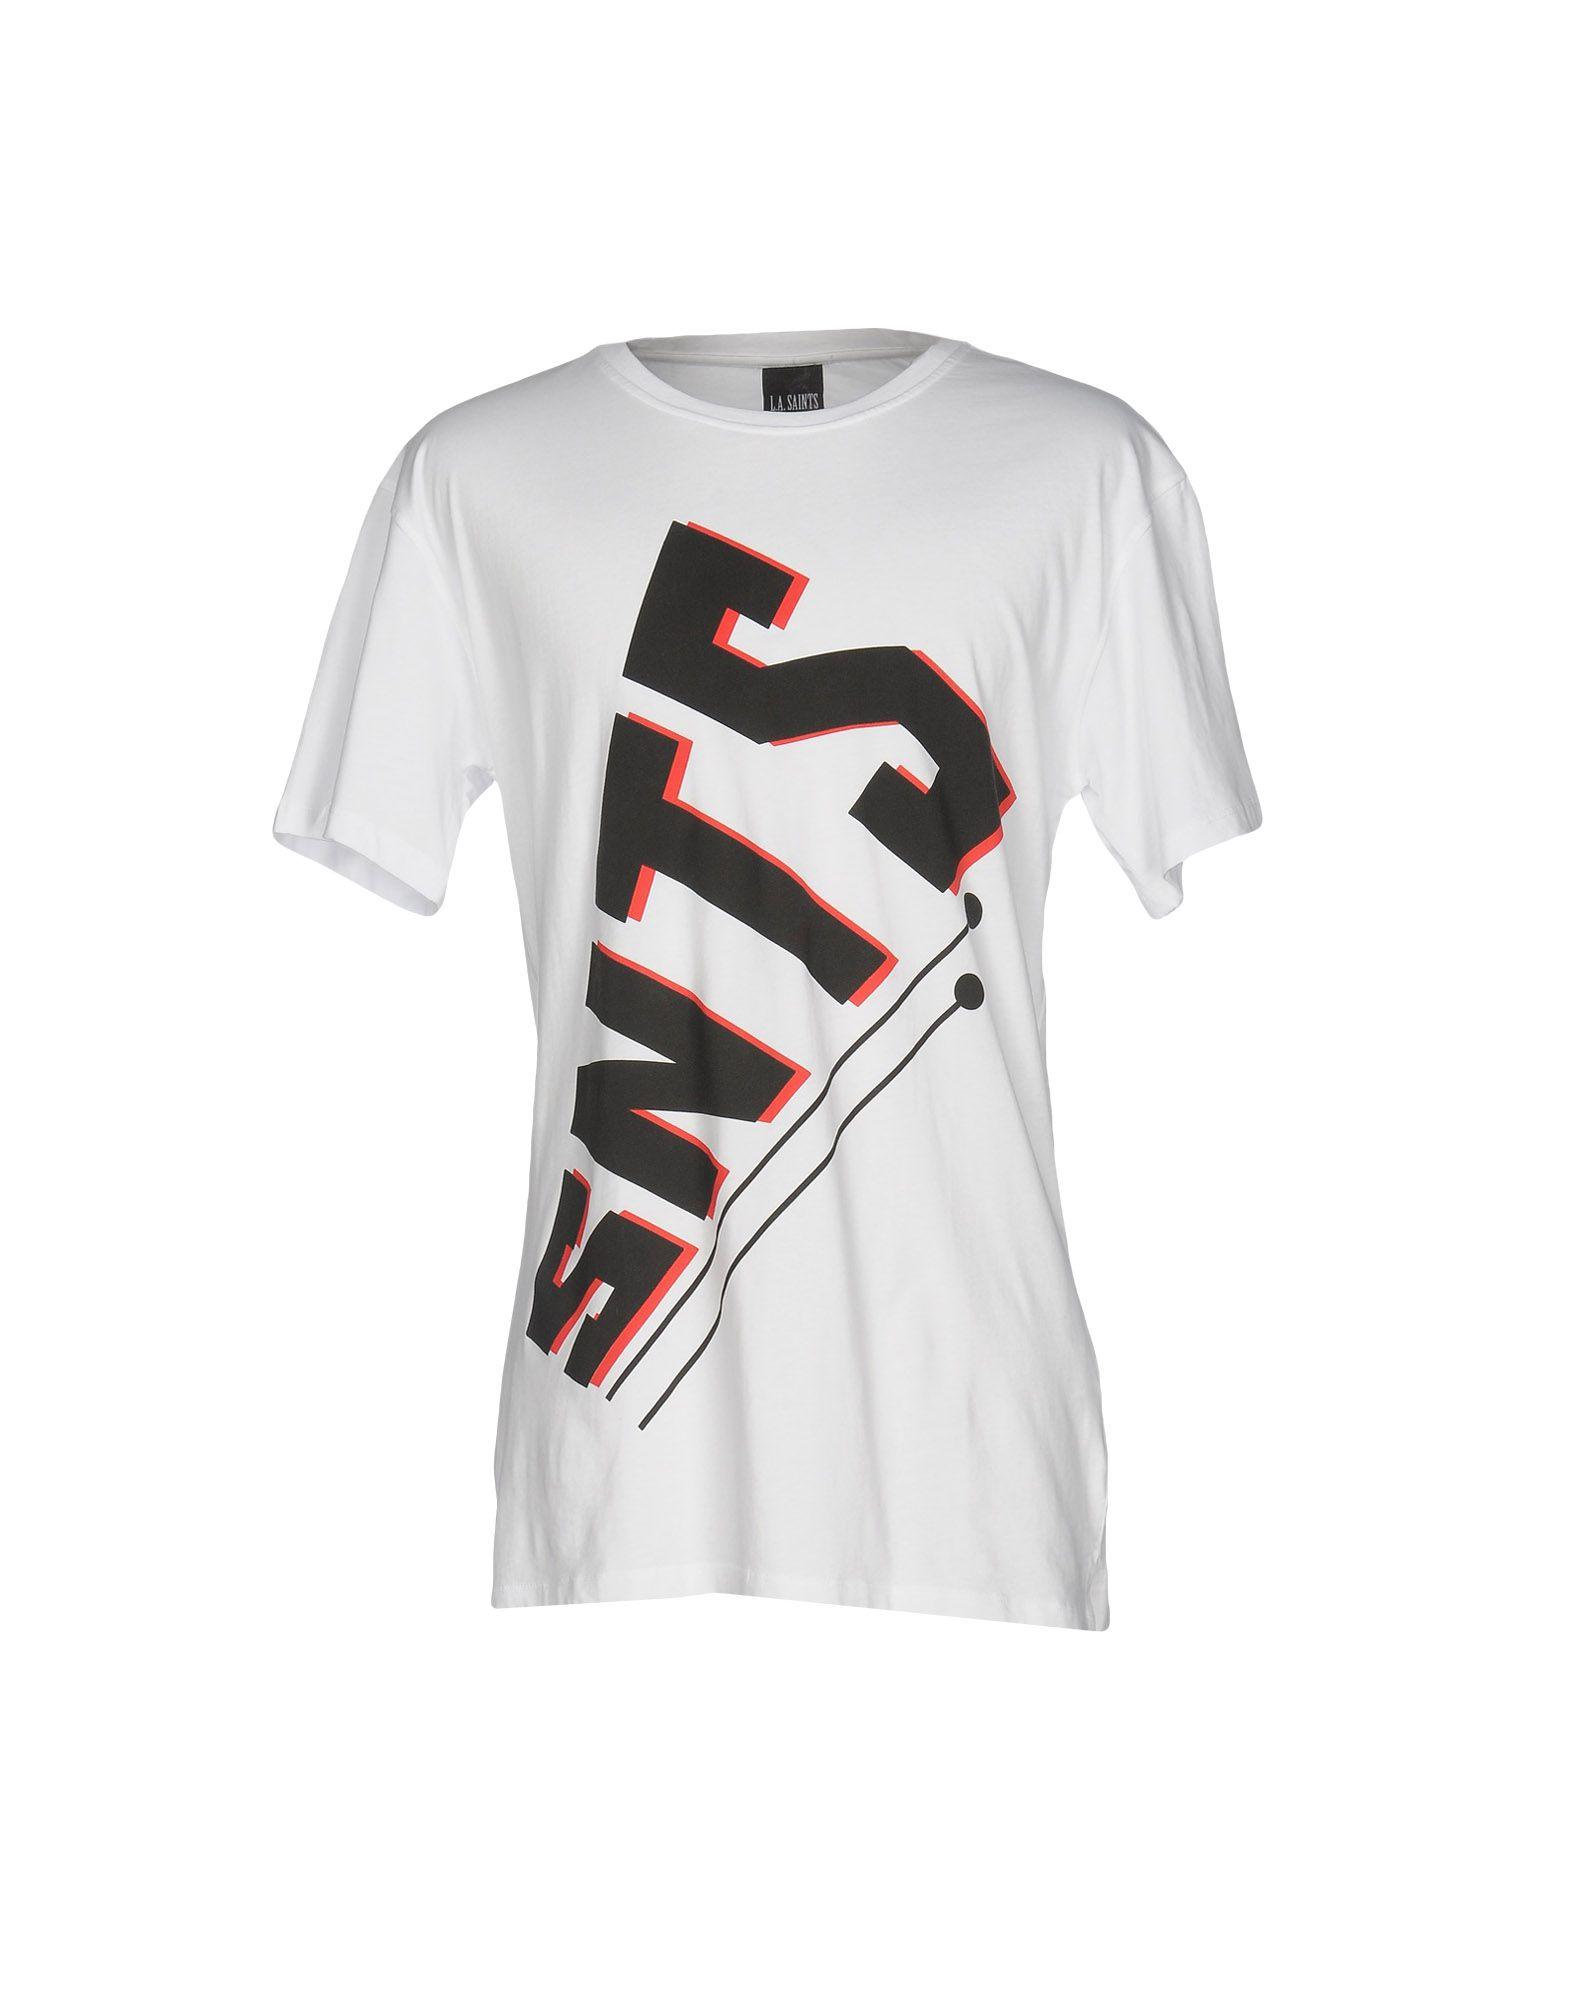 L.A. SAINTS Футболка футболка классическая printio saints row 2 blak